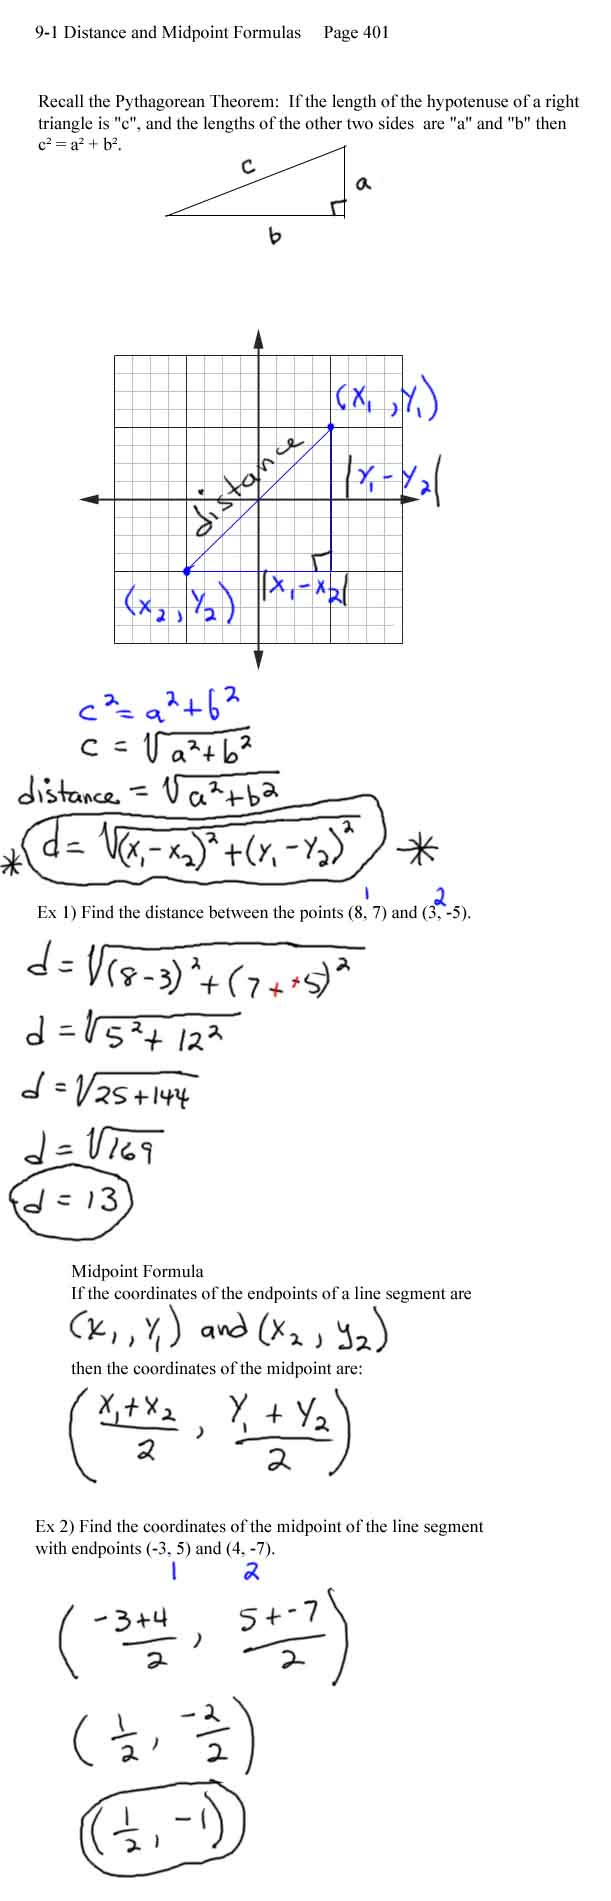 Bestseller: Springboard Algebra 1 Answer Key Page 14